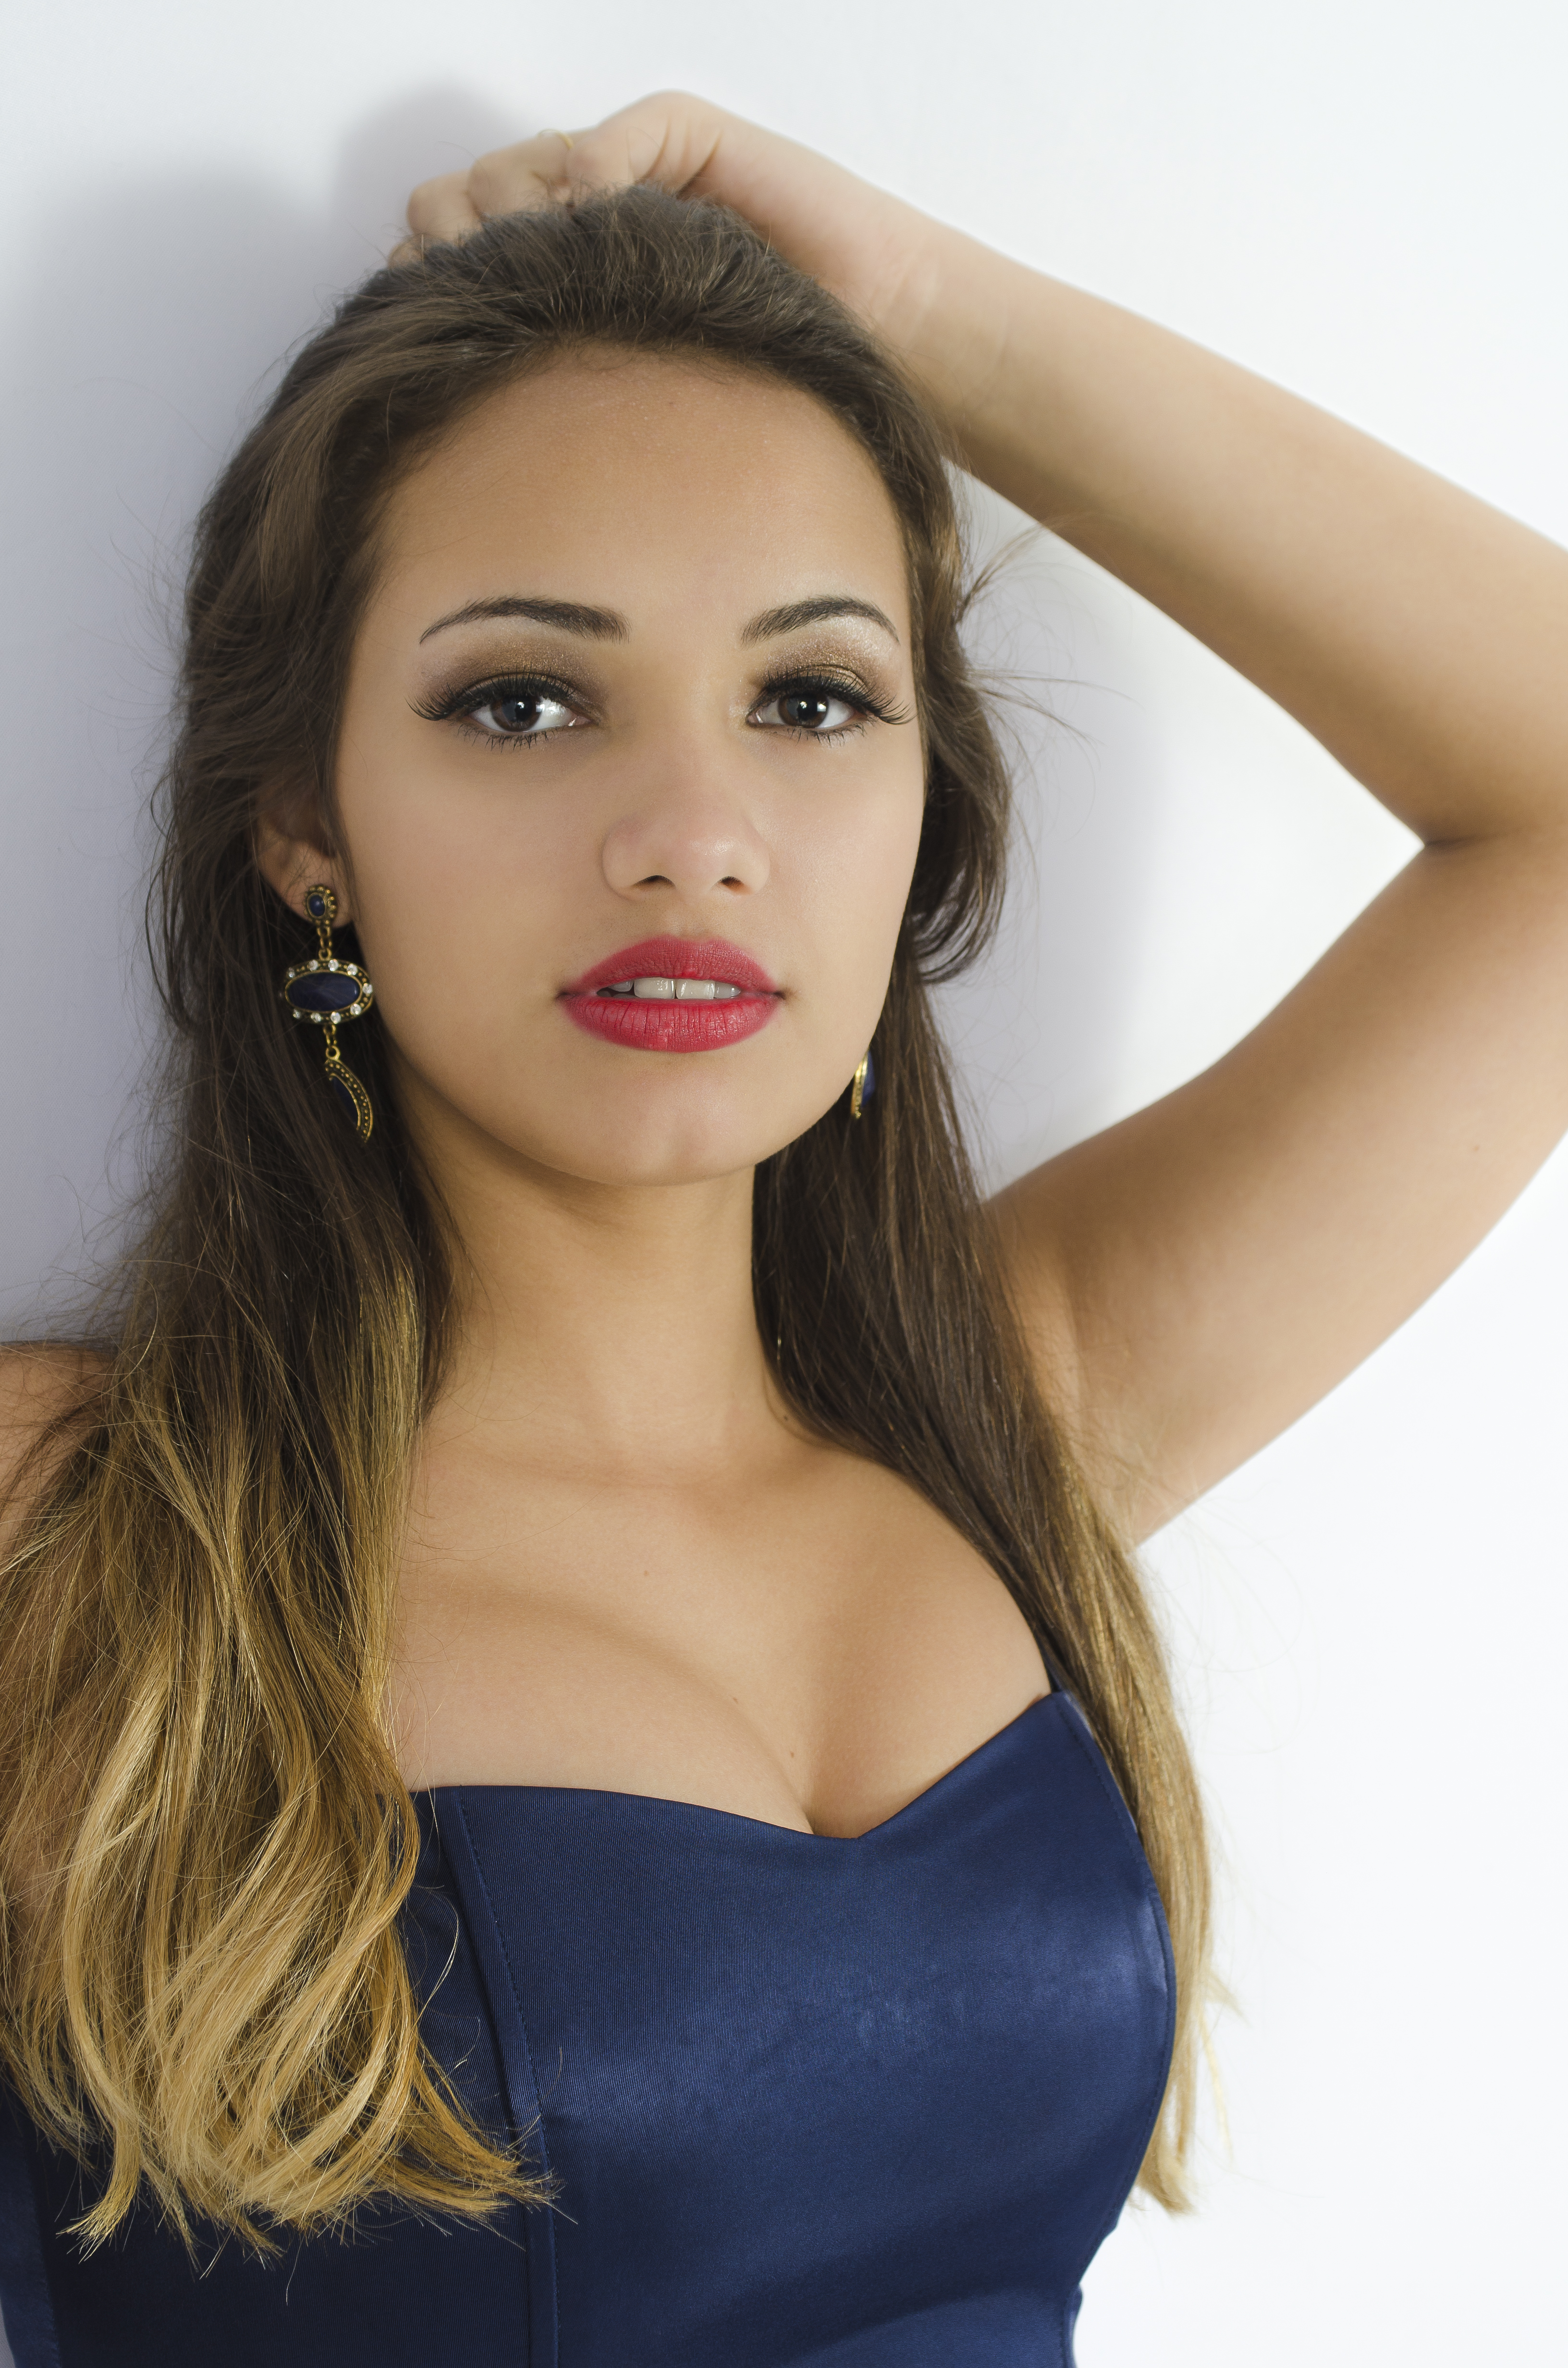 Laysla Mabilly